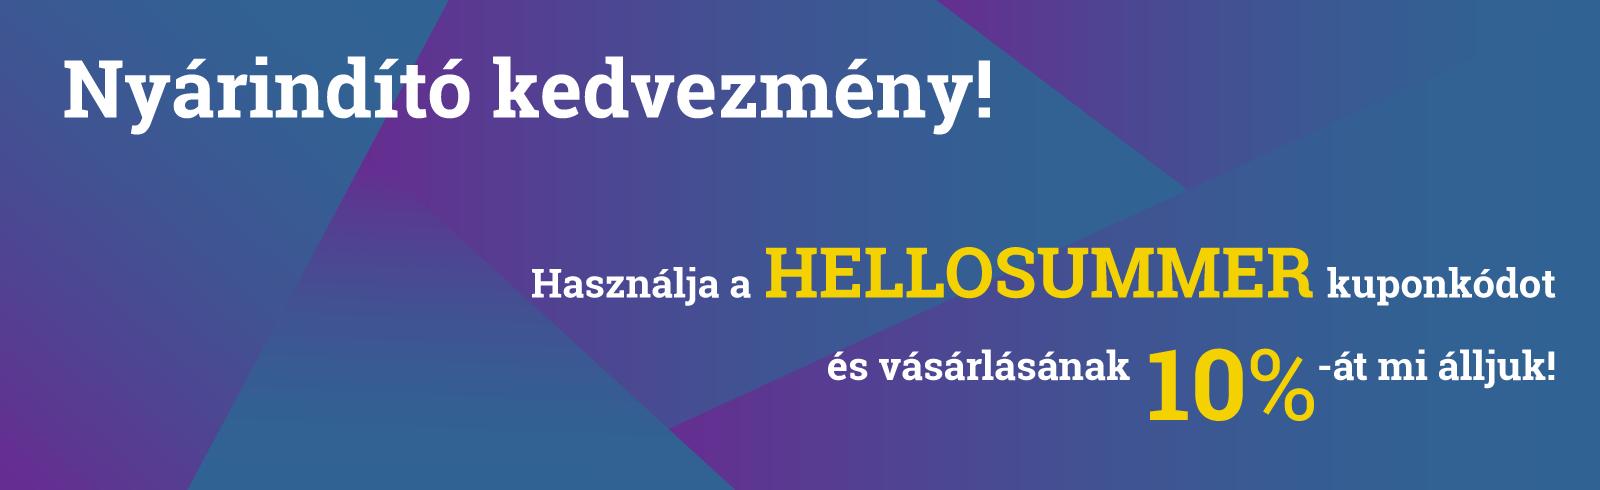 hellosummer